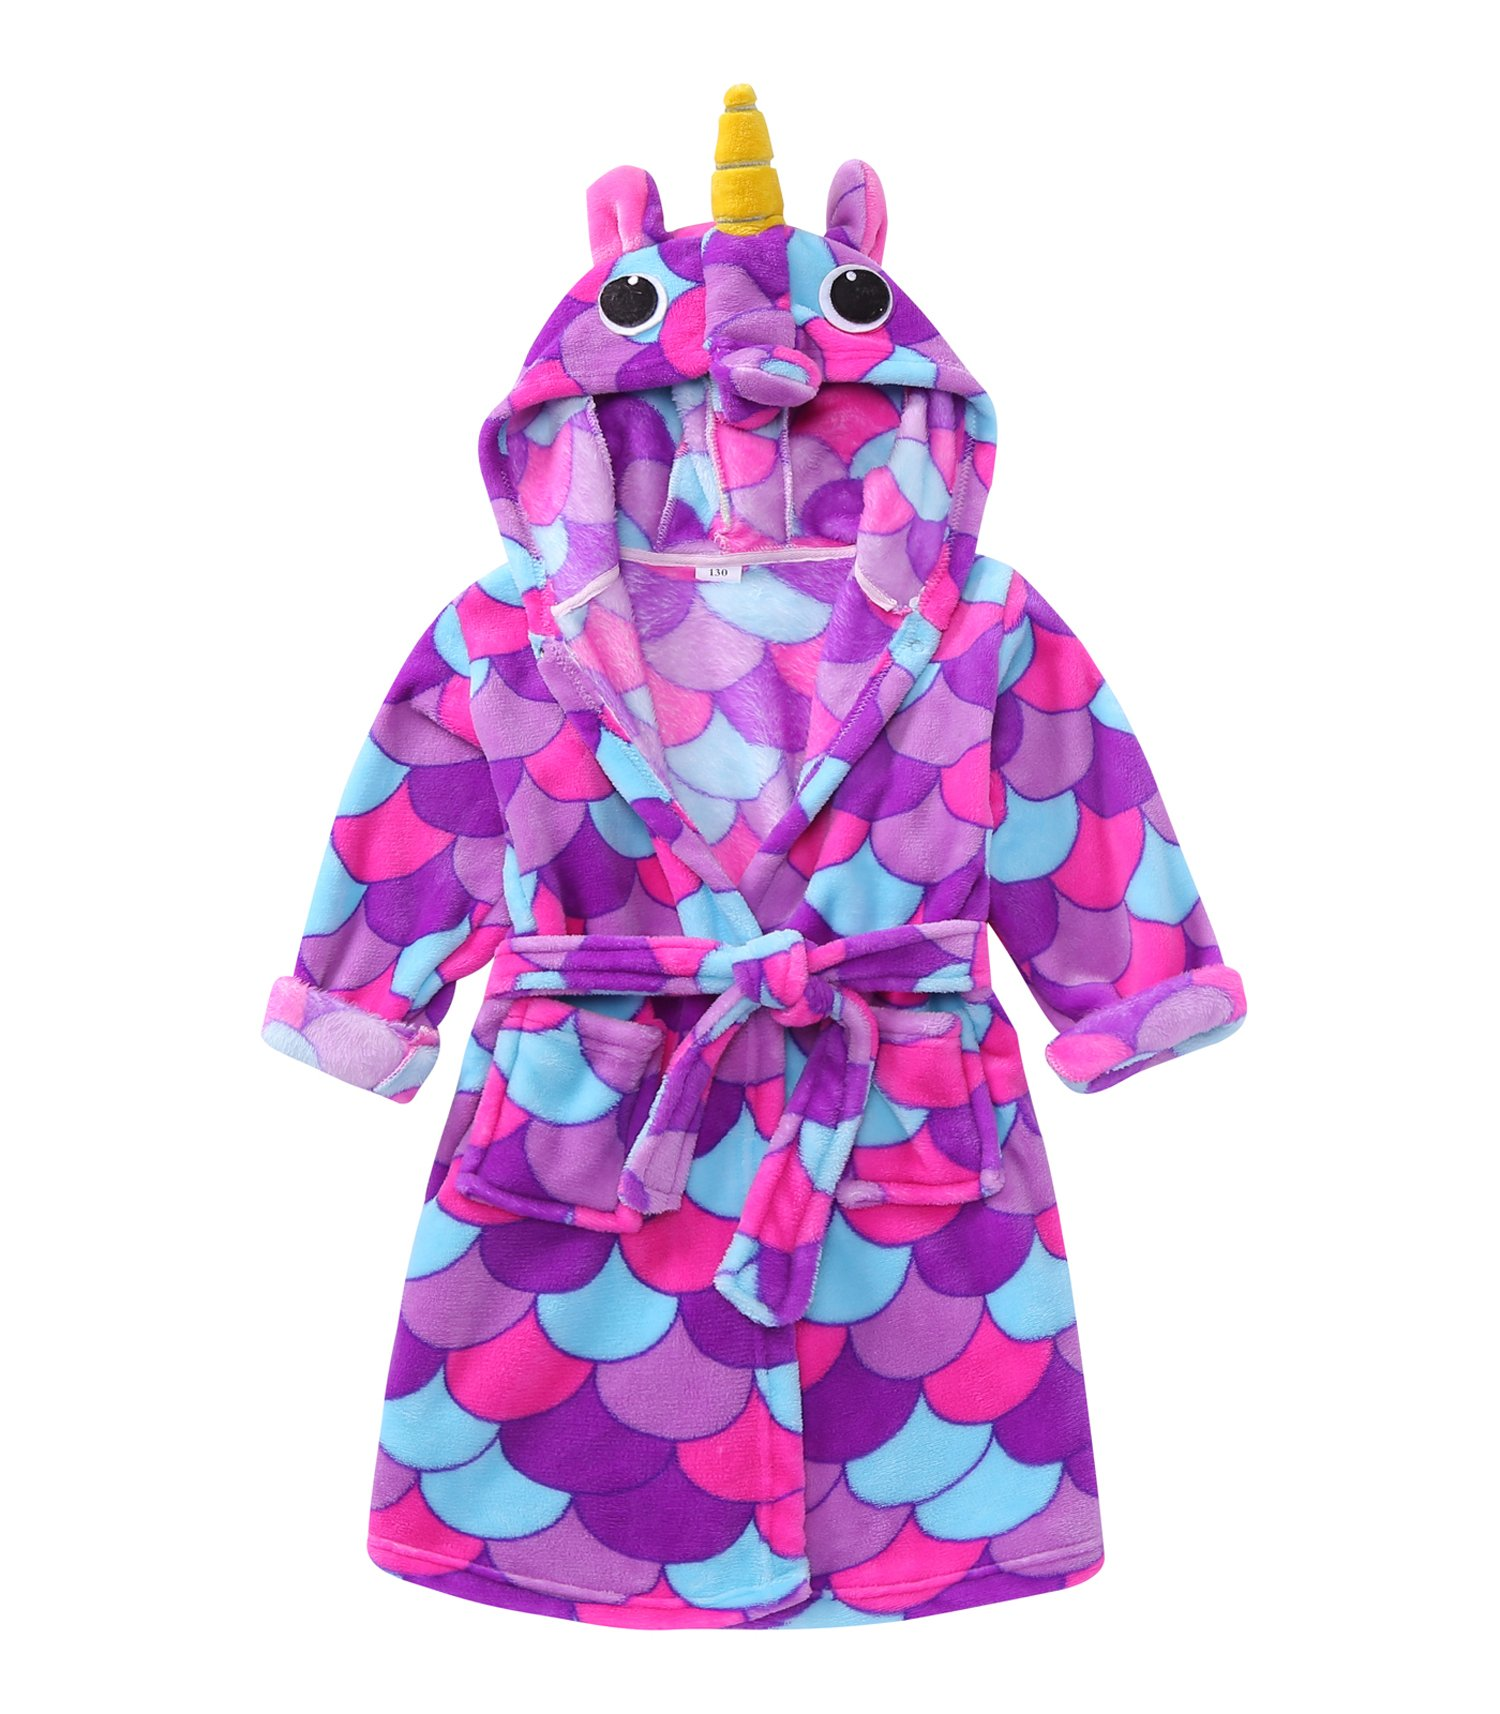 TOLLION Toddlers/Kids Hooded Girls Animal Fleece Bathrobe Boys Plush Robe Pajamas Sleepwear (3T, Unicorn Purple)